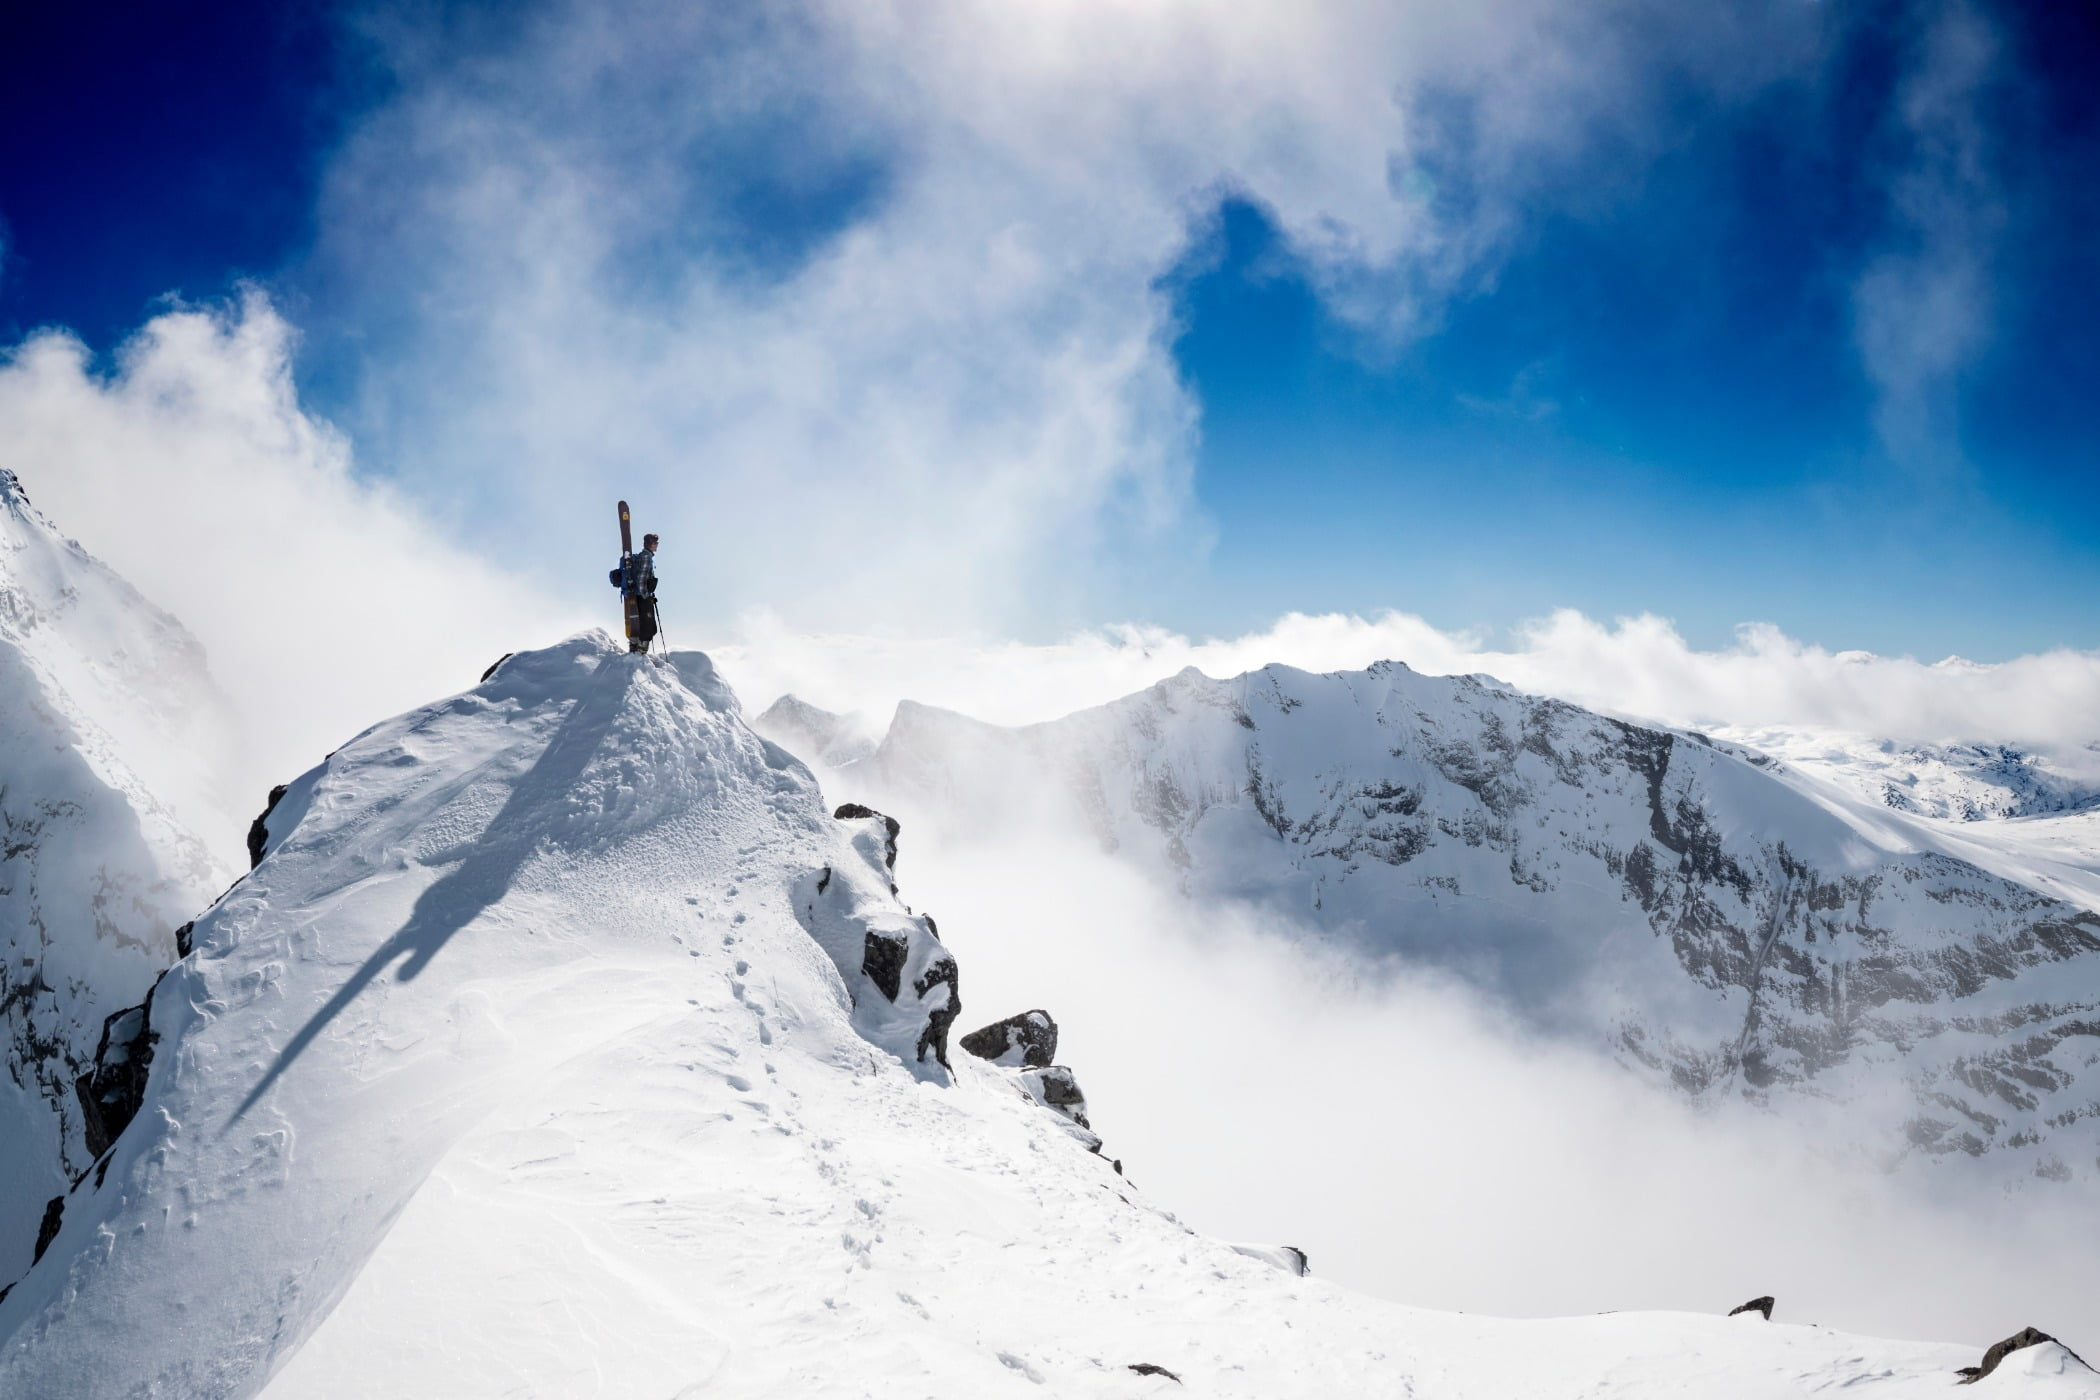 Glacial landform, Mountainous landforms, Adventure, Summit, Terrain, Mountain, Snow, Slope, Cloud, Winter